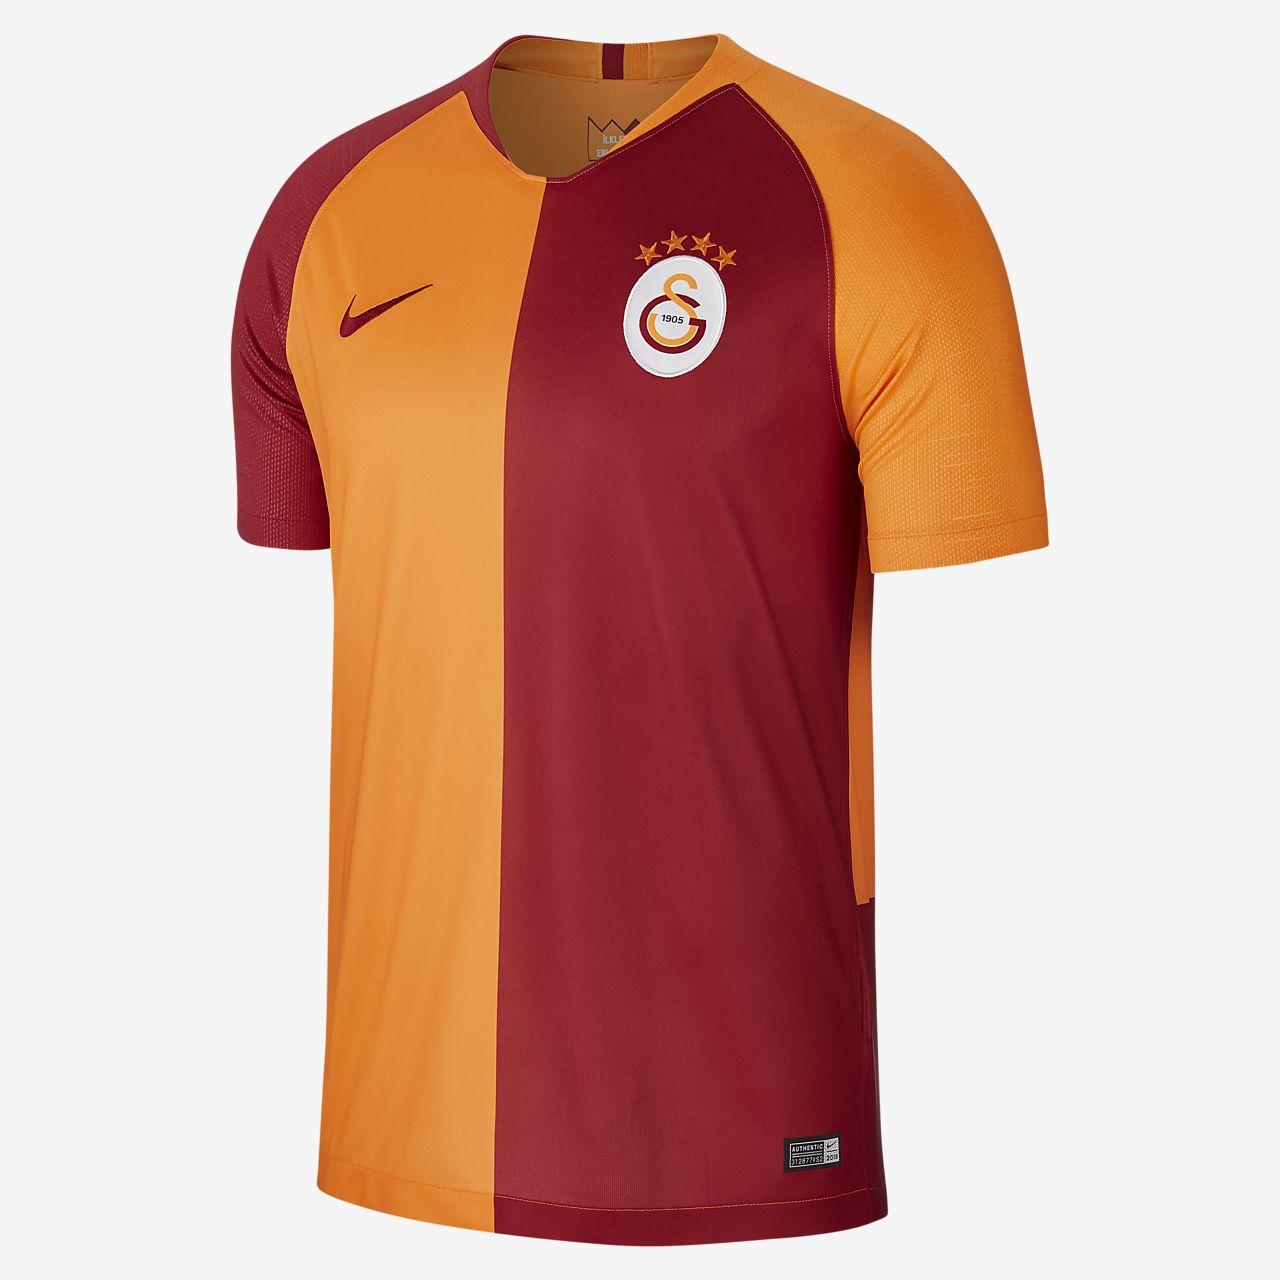 40f10c8c94bed Camiseta de fútbol para hombre 2018 19 Galatasaray S.K. Stadium Home ...